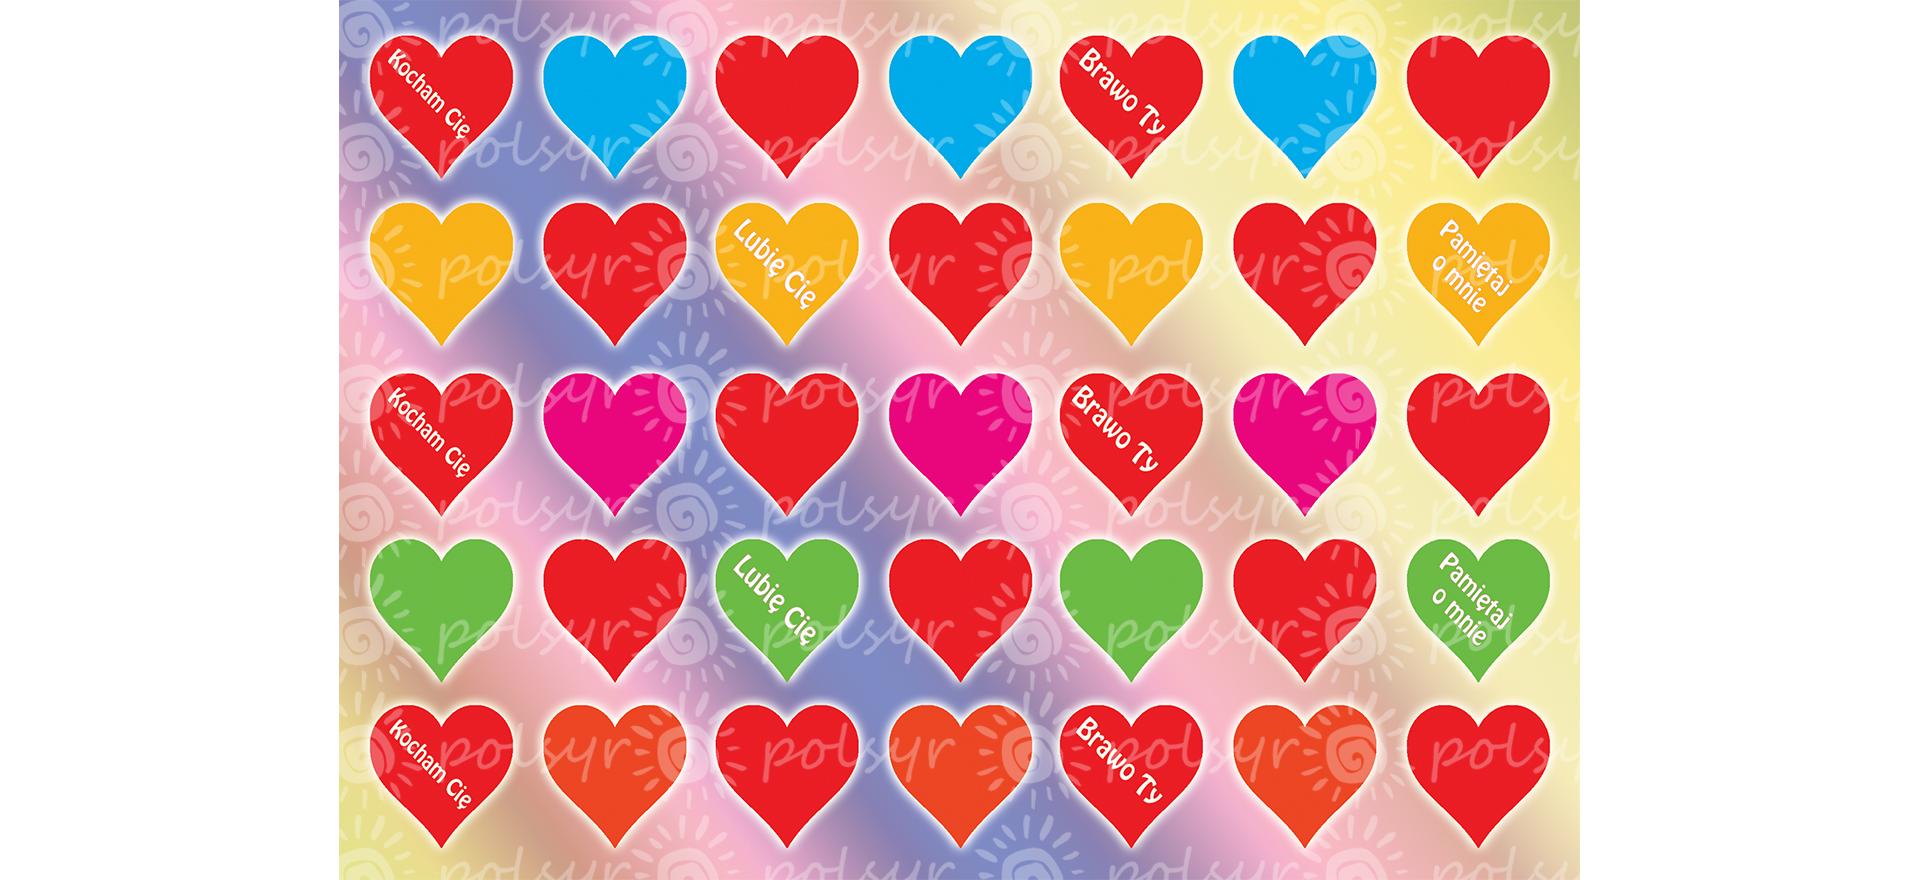 naklejki-serca-duze-polsyr-1